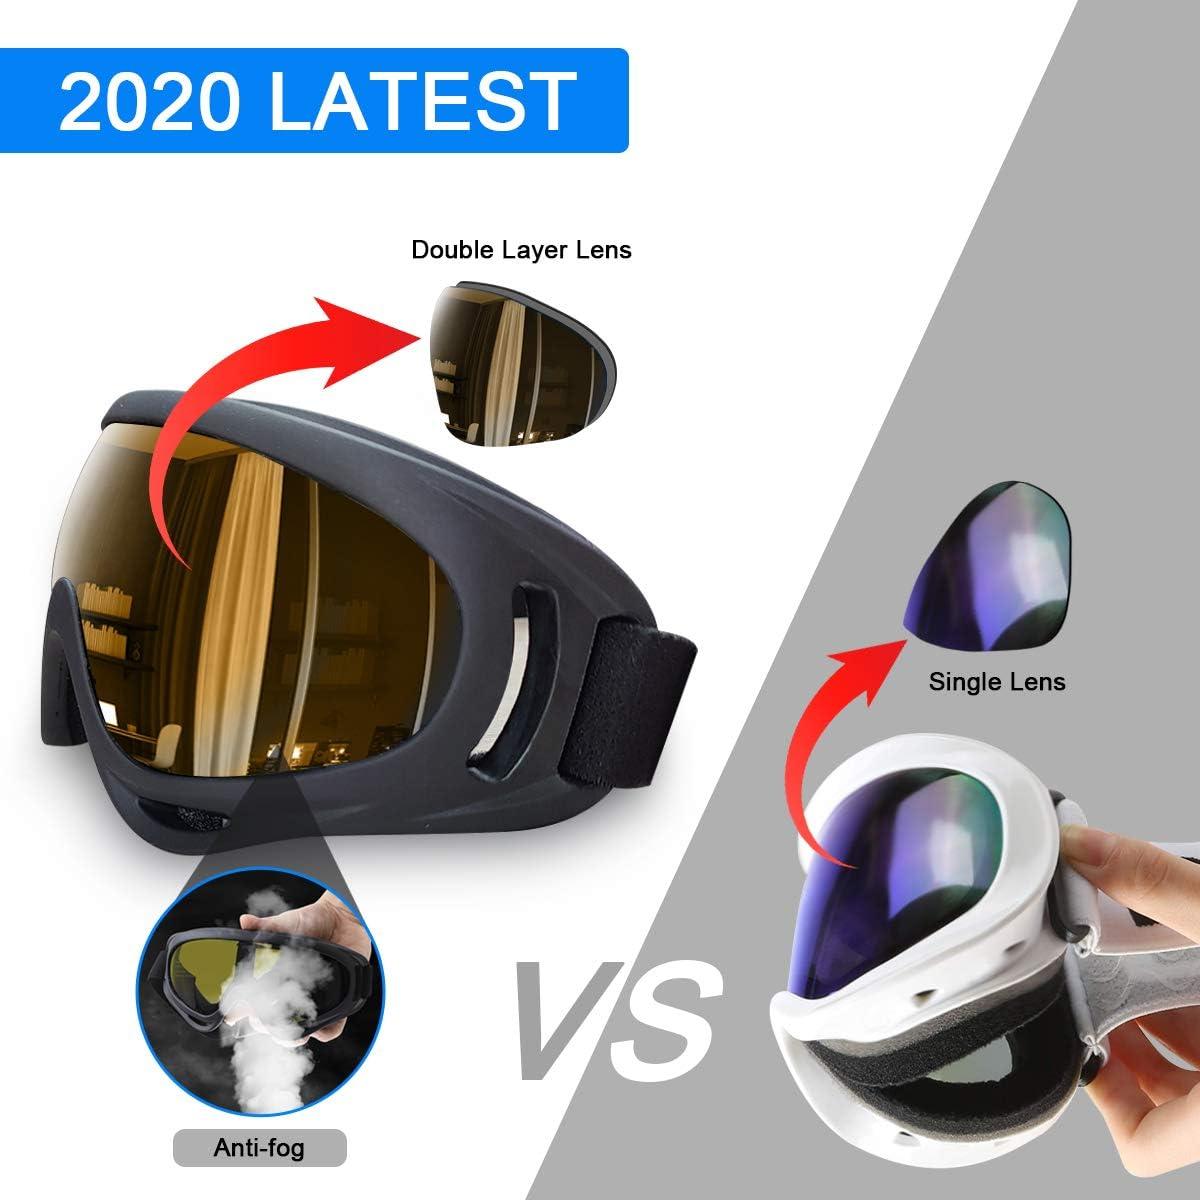 Pack of 2 DODENSHA Ski Goggles,Snowboard Motorcycle Goggles for Women Men Kids Anti-UV Anti-Fog ATV Dirt Bike Riding Goggles